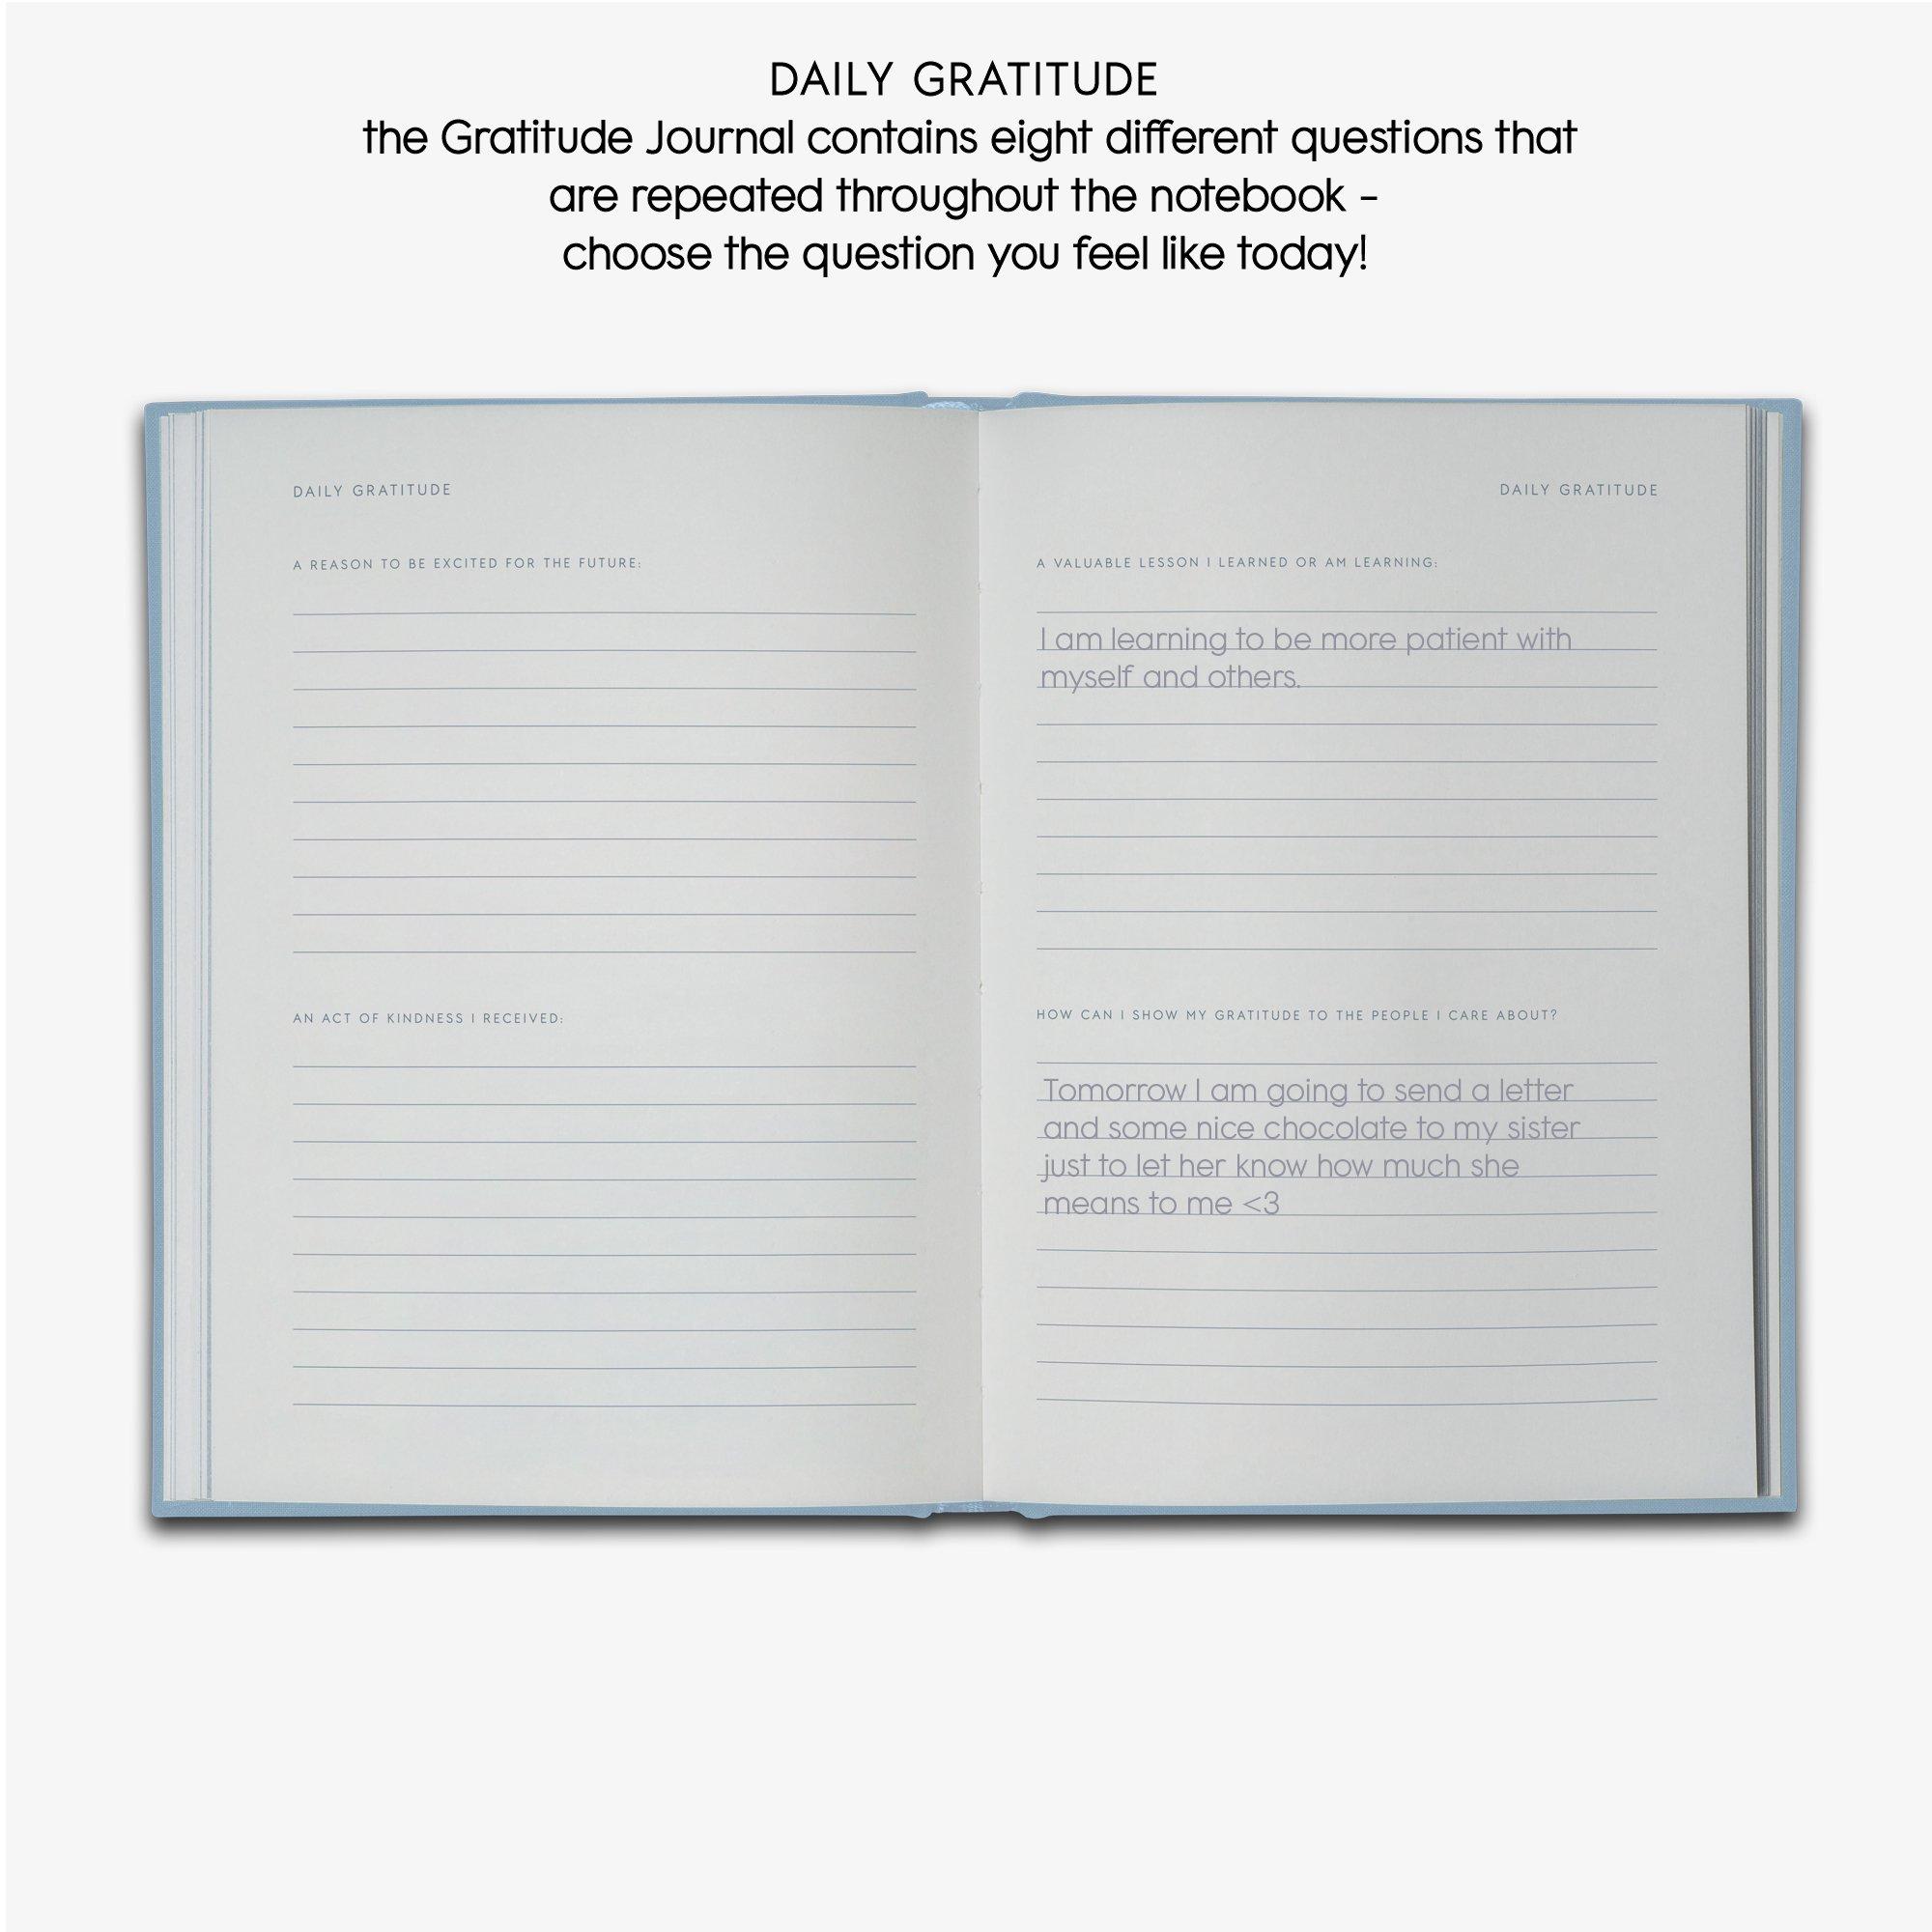 KARTOTEK - Gratitude journal